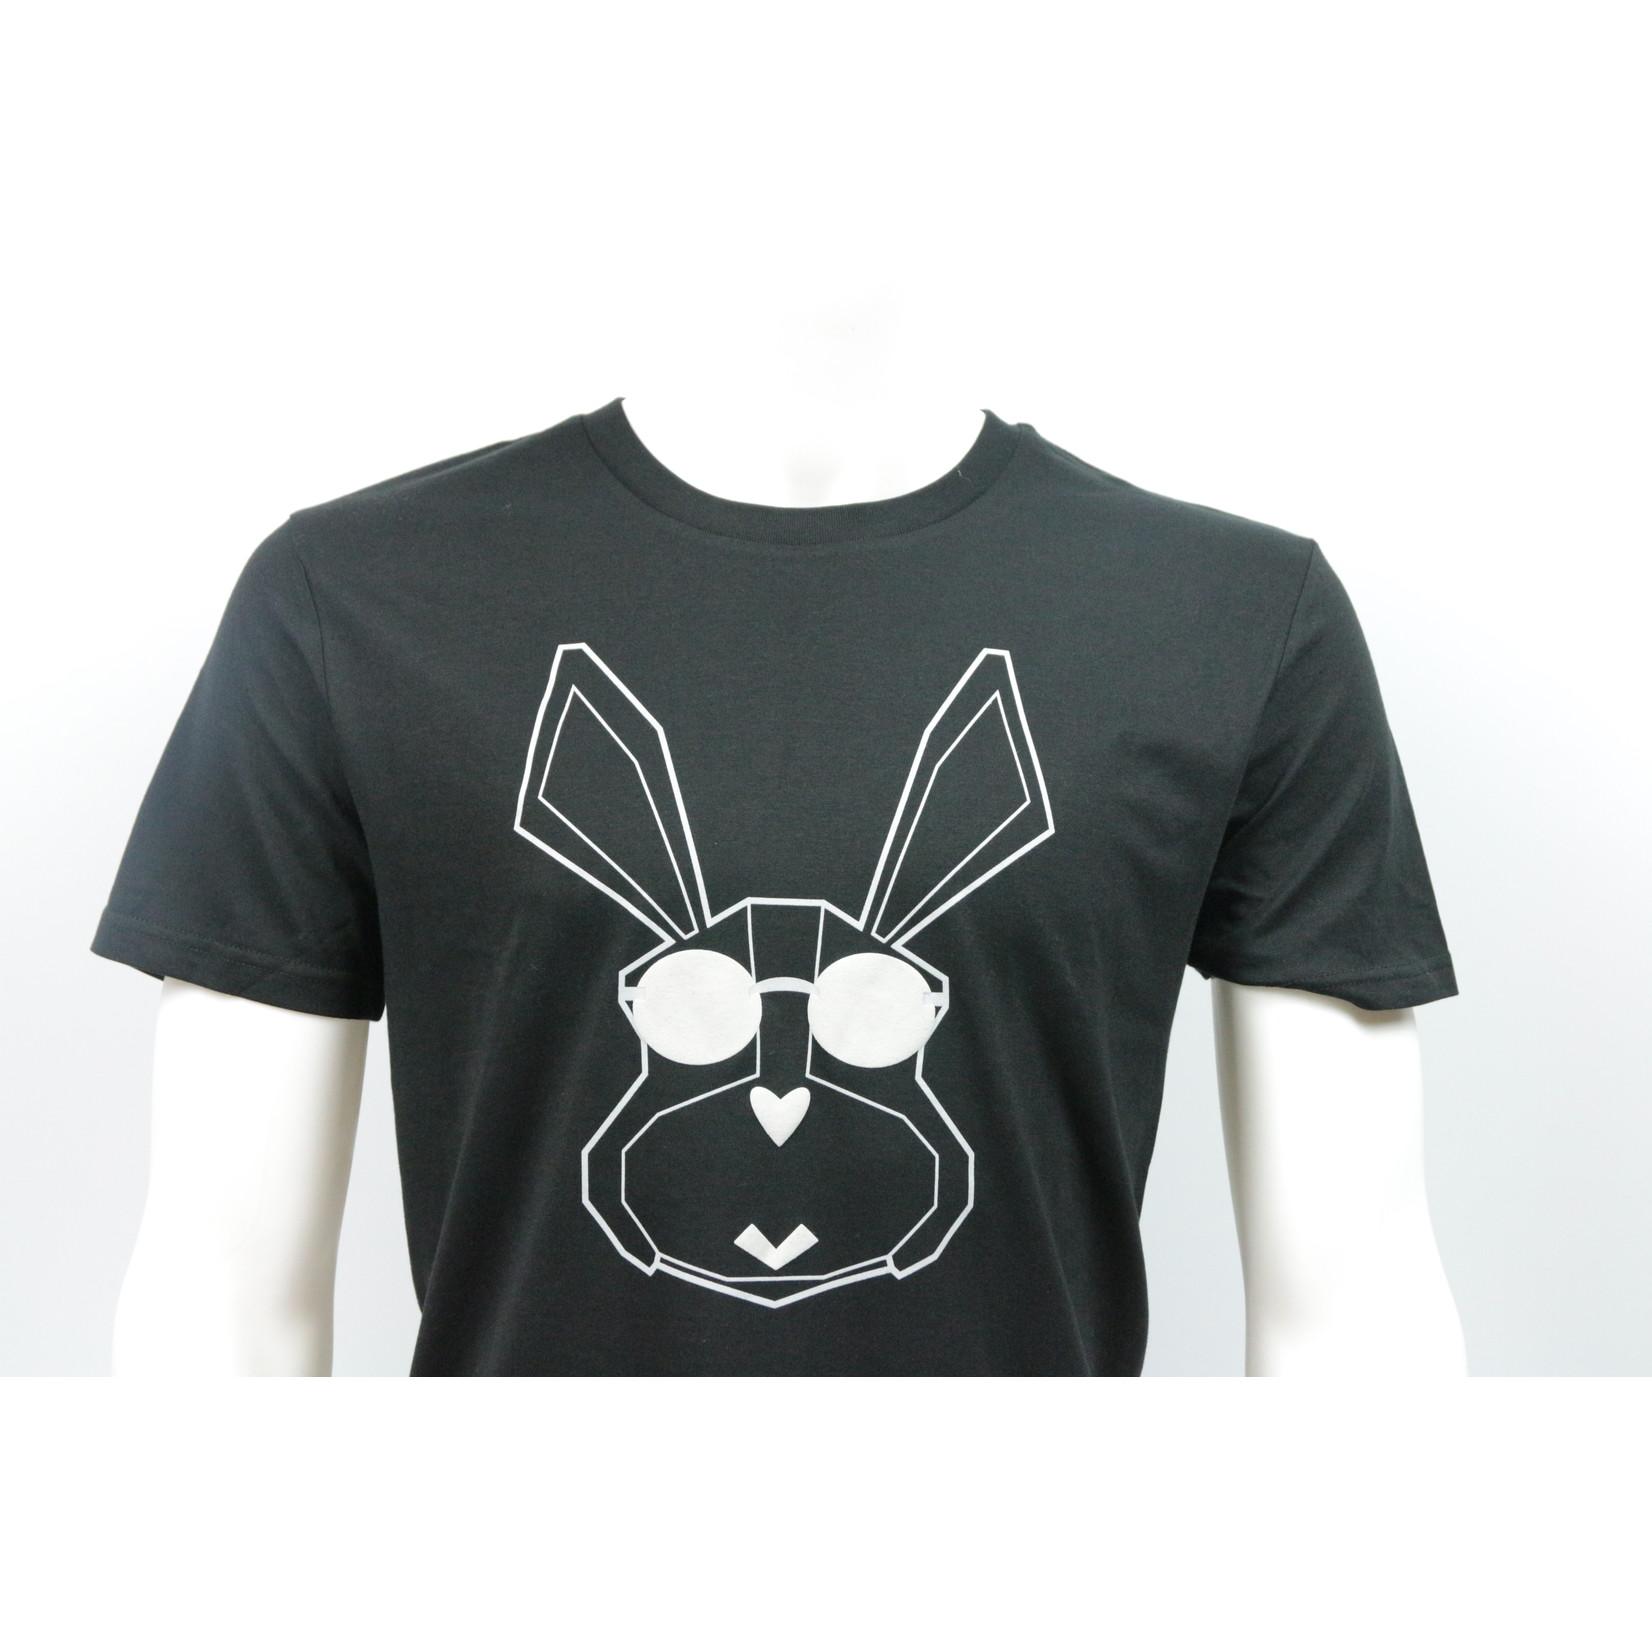 The Cool Rabbit Essentials High Falcon T-shirt Men